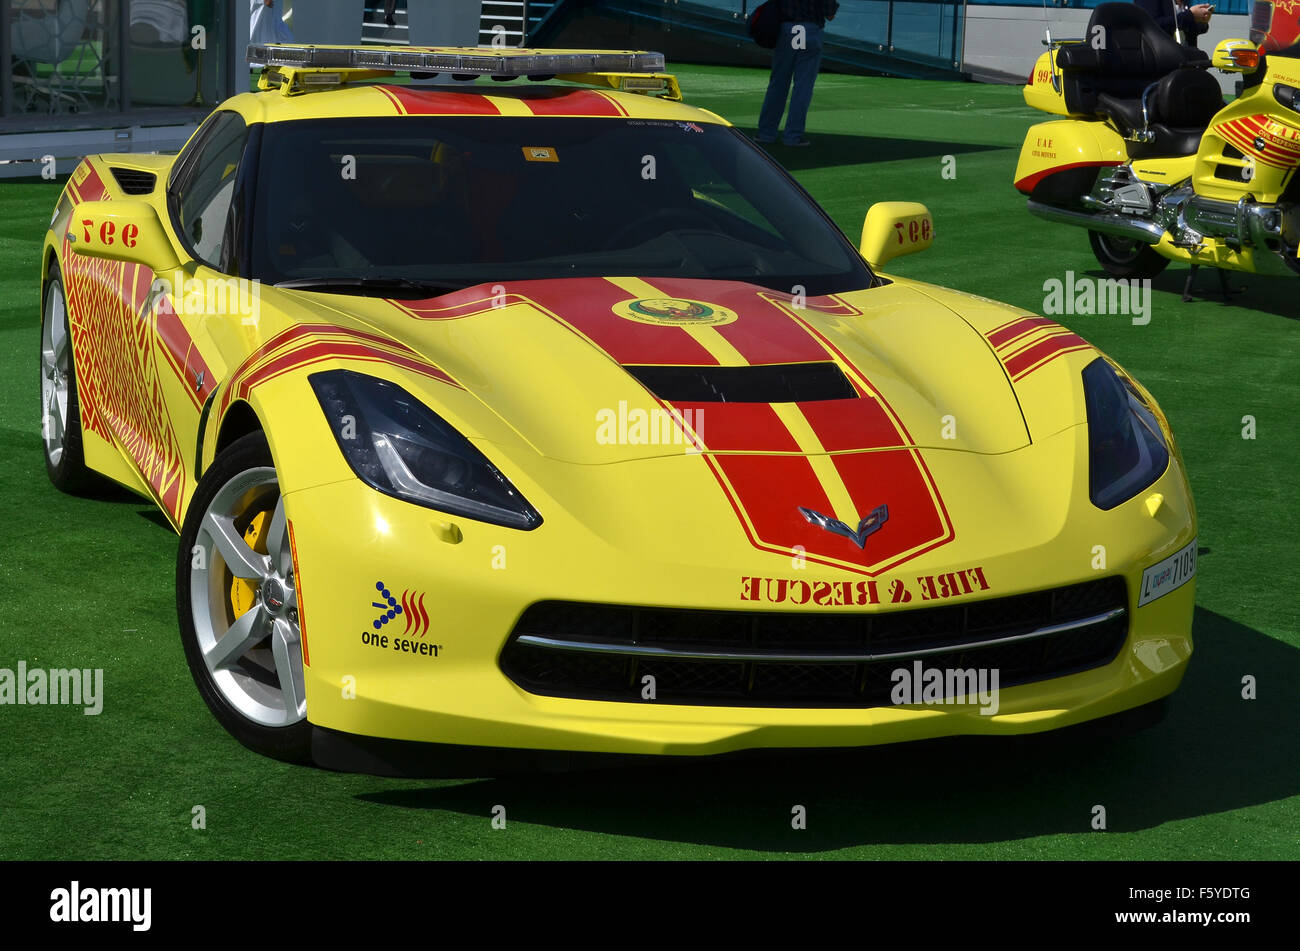 Dubai, UAE. 10th November, 2015. Hot Rod: Dubai Civil Defence are using a brght yellow V8-powered Chevrolet Corvette Stock Photo